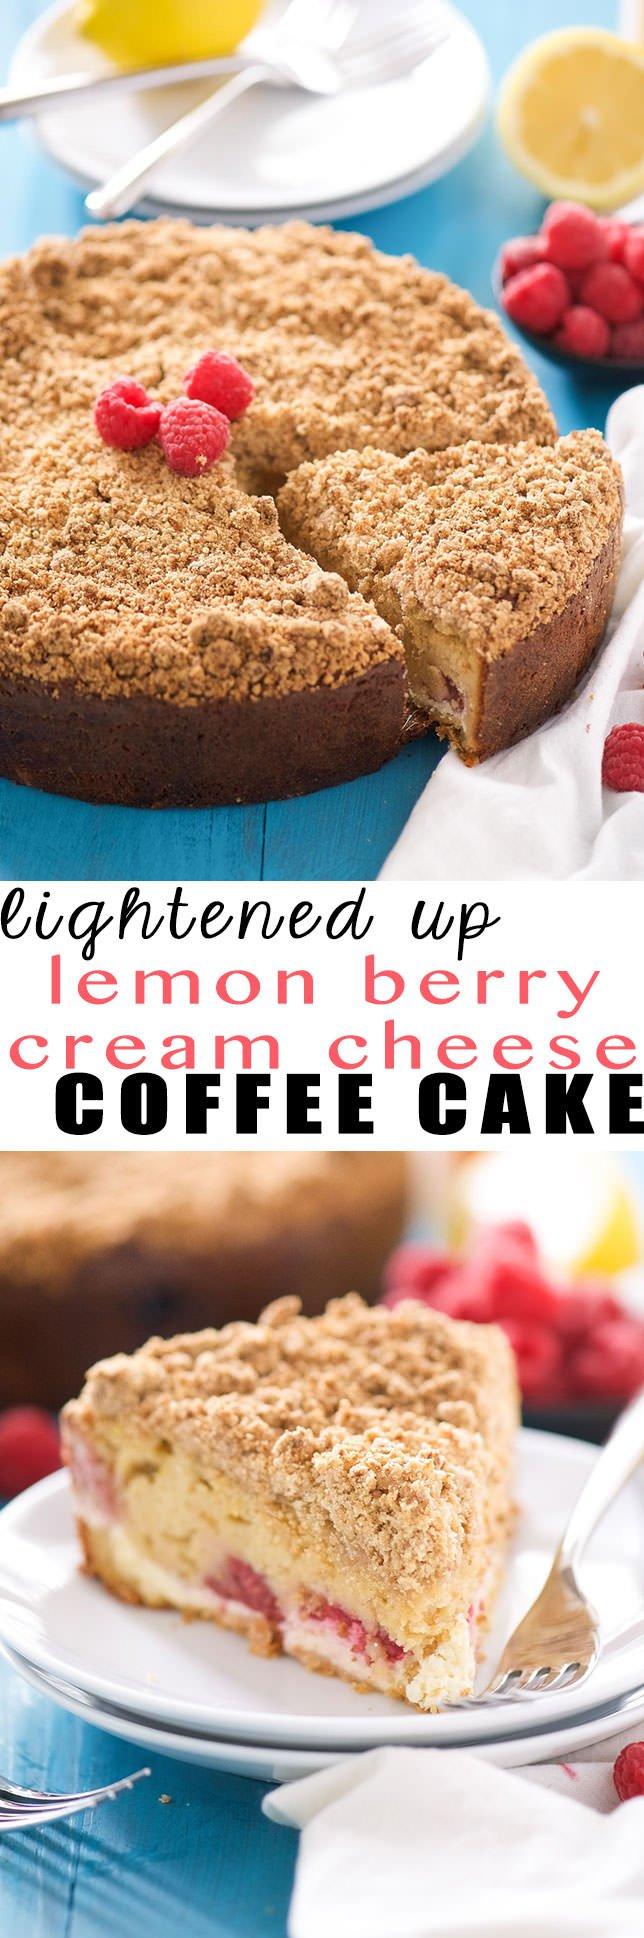 Lightend Up Lemon Berry Cream Cheese Coffee Cake Recipe